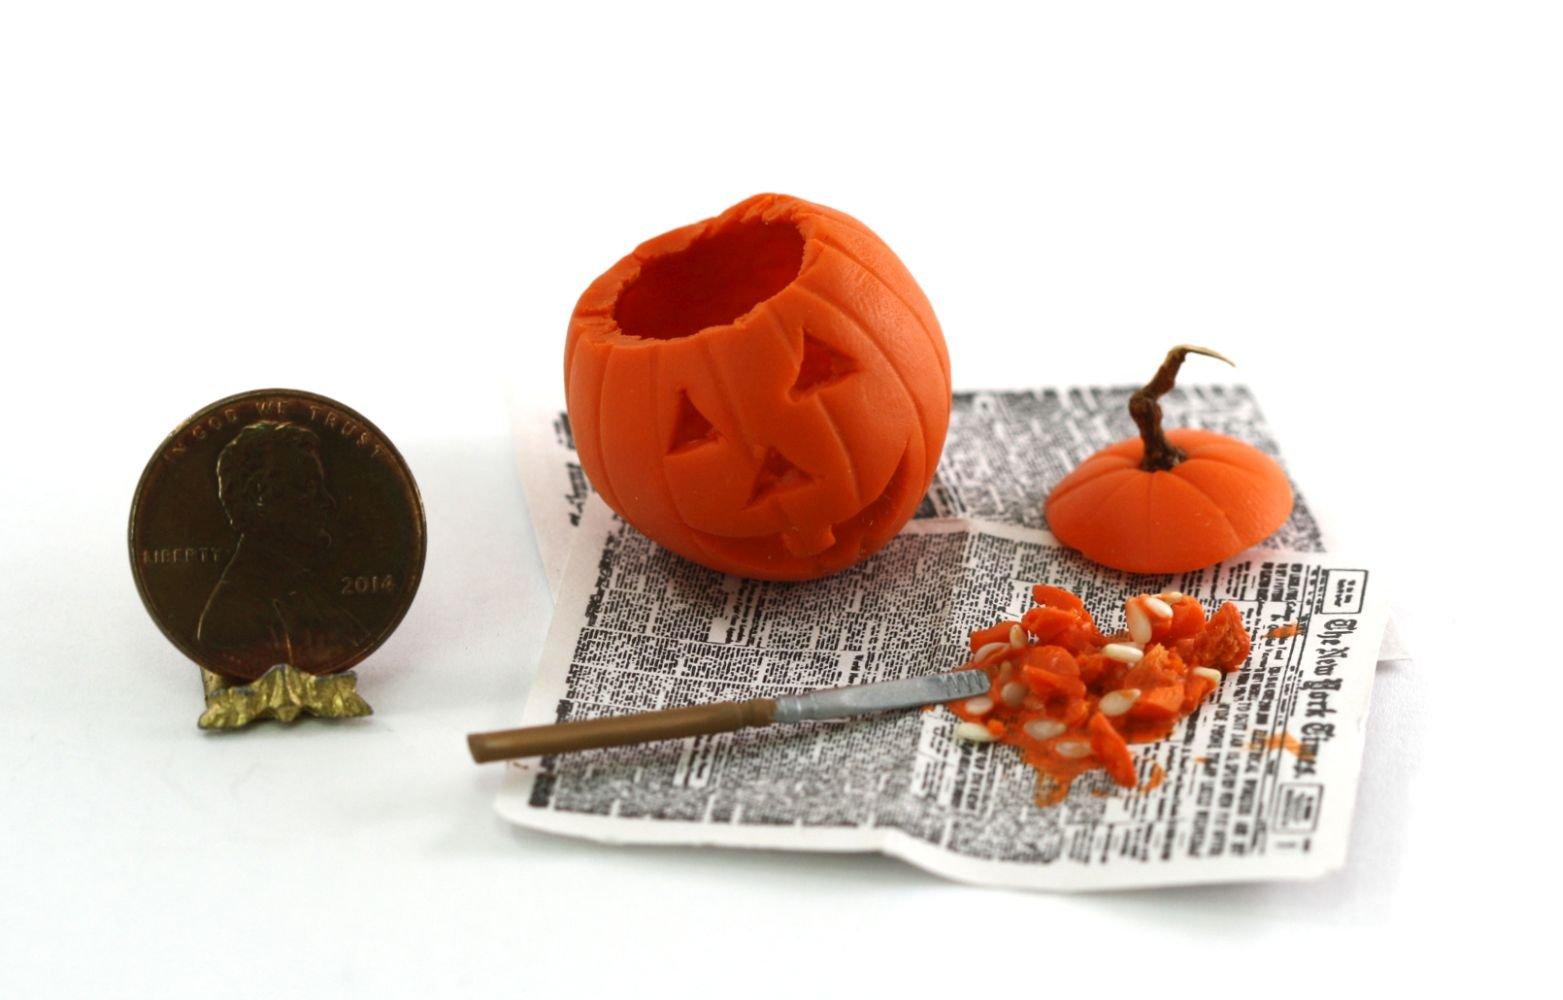 Dollhouse Miniature Halloween Pumpkin Carving in Progress by Amy Robinson